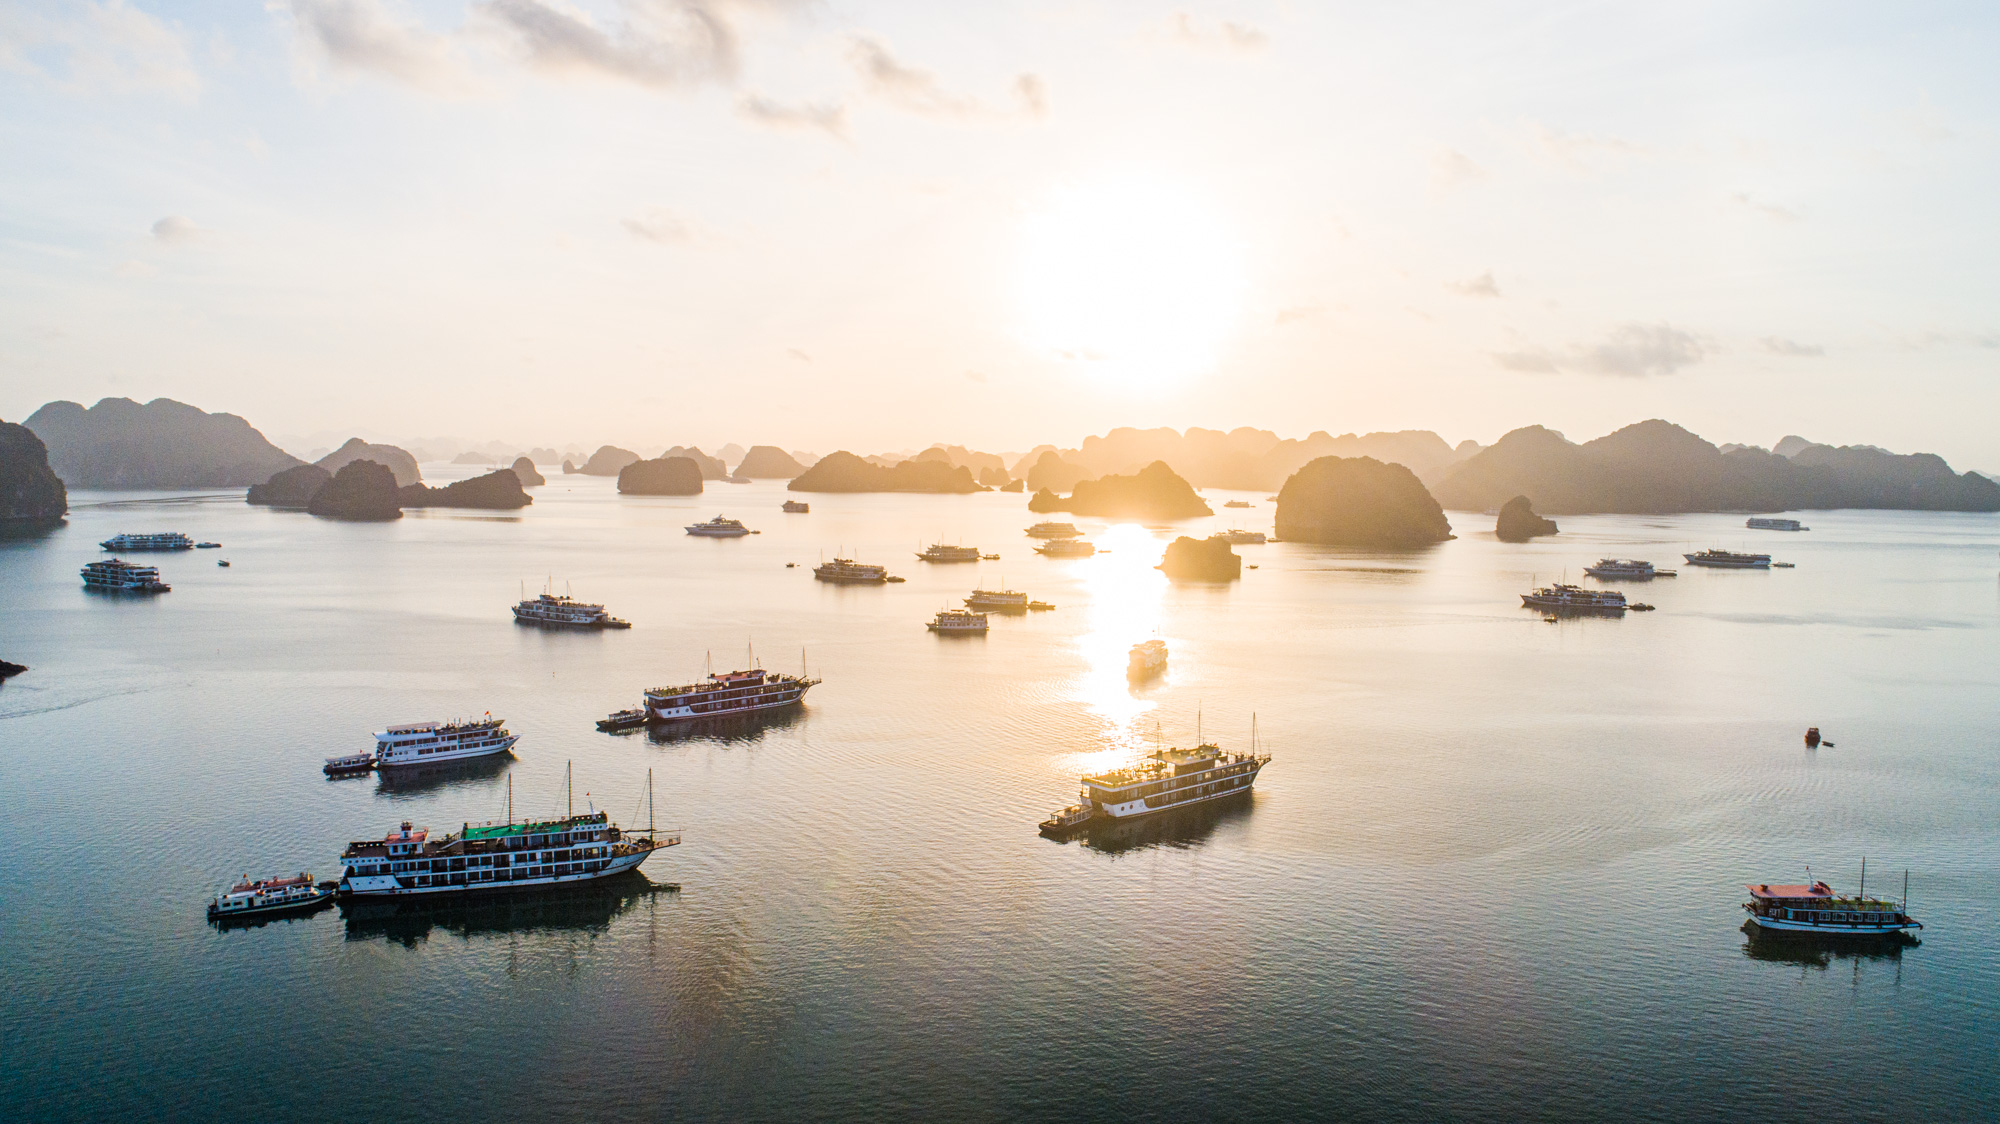 The aquamarine Gulf of Tonkin covers three bays: Halong Bay, Lan Ha Bay and Bai Tu Long Bay.